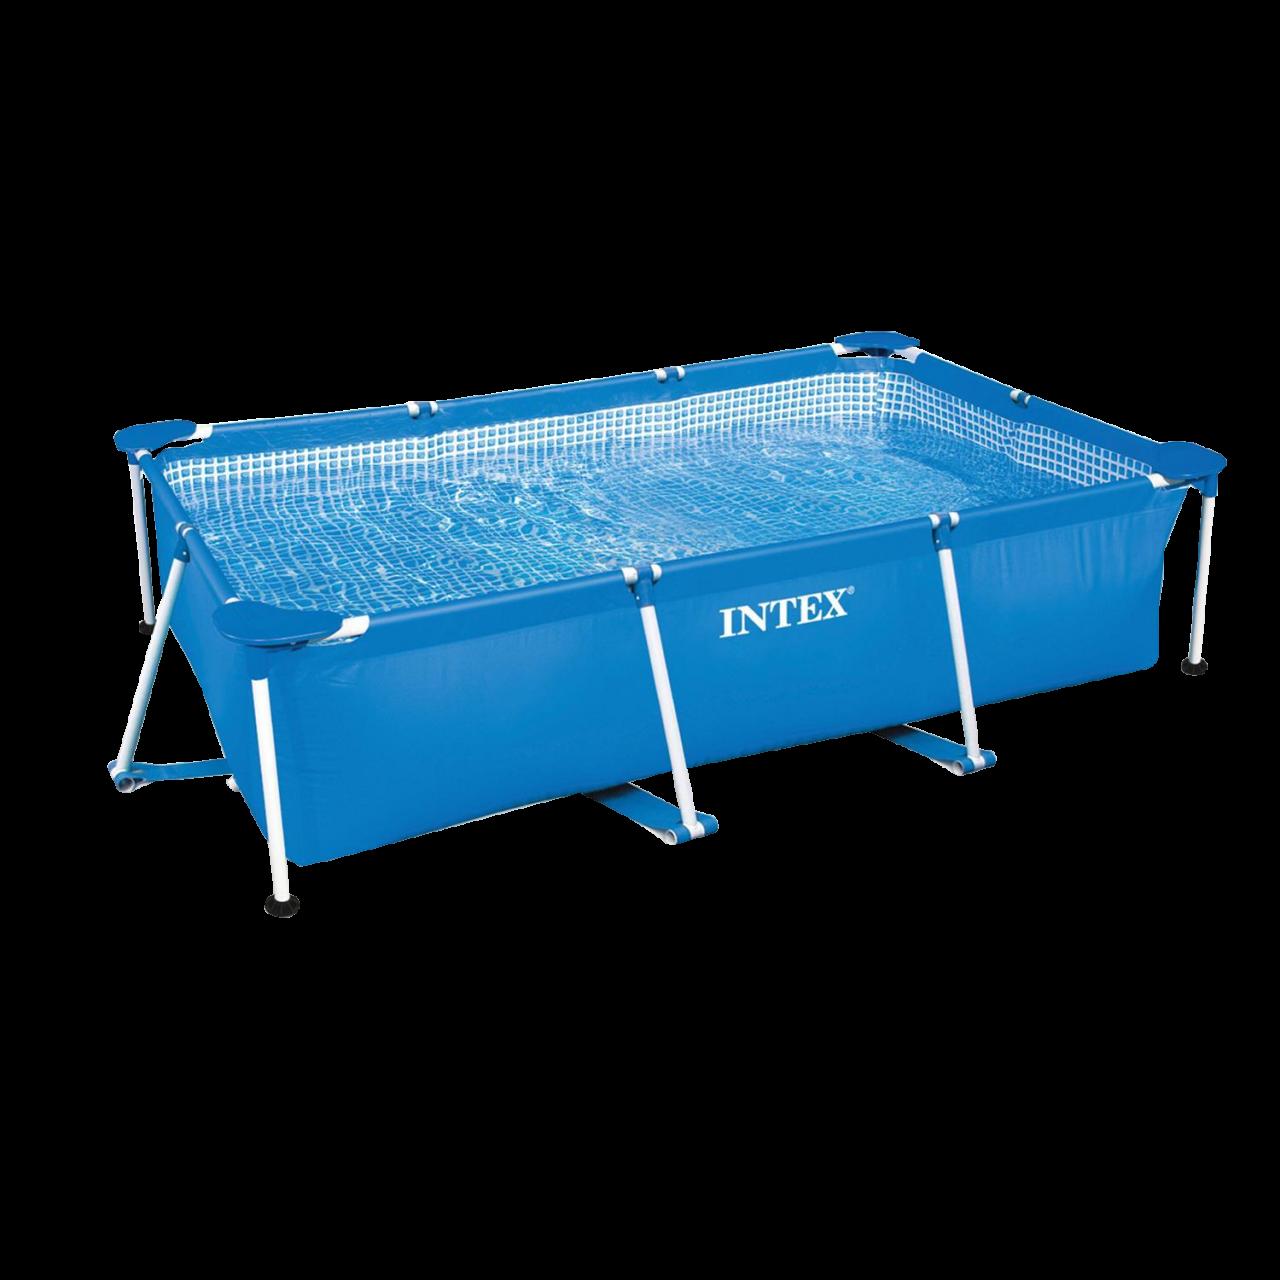 Intex 28271 Family Schwimmbad Pool Rechteck Frame Swimmingpool 260x160x65cm